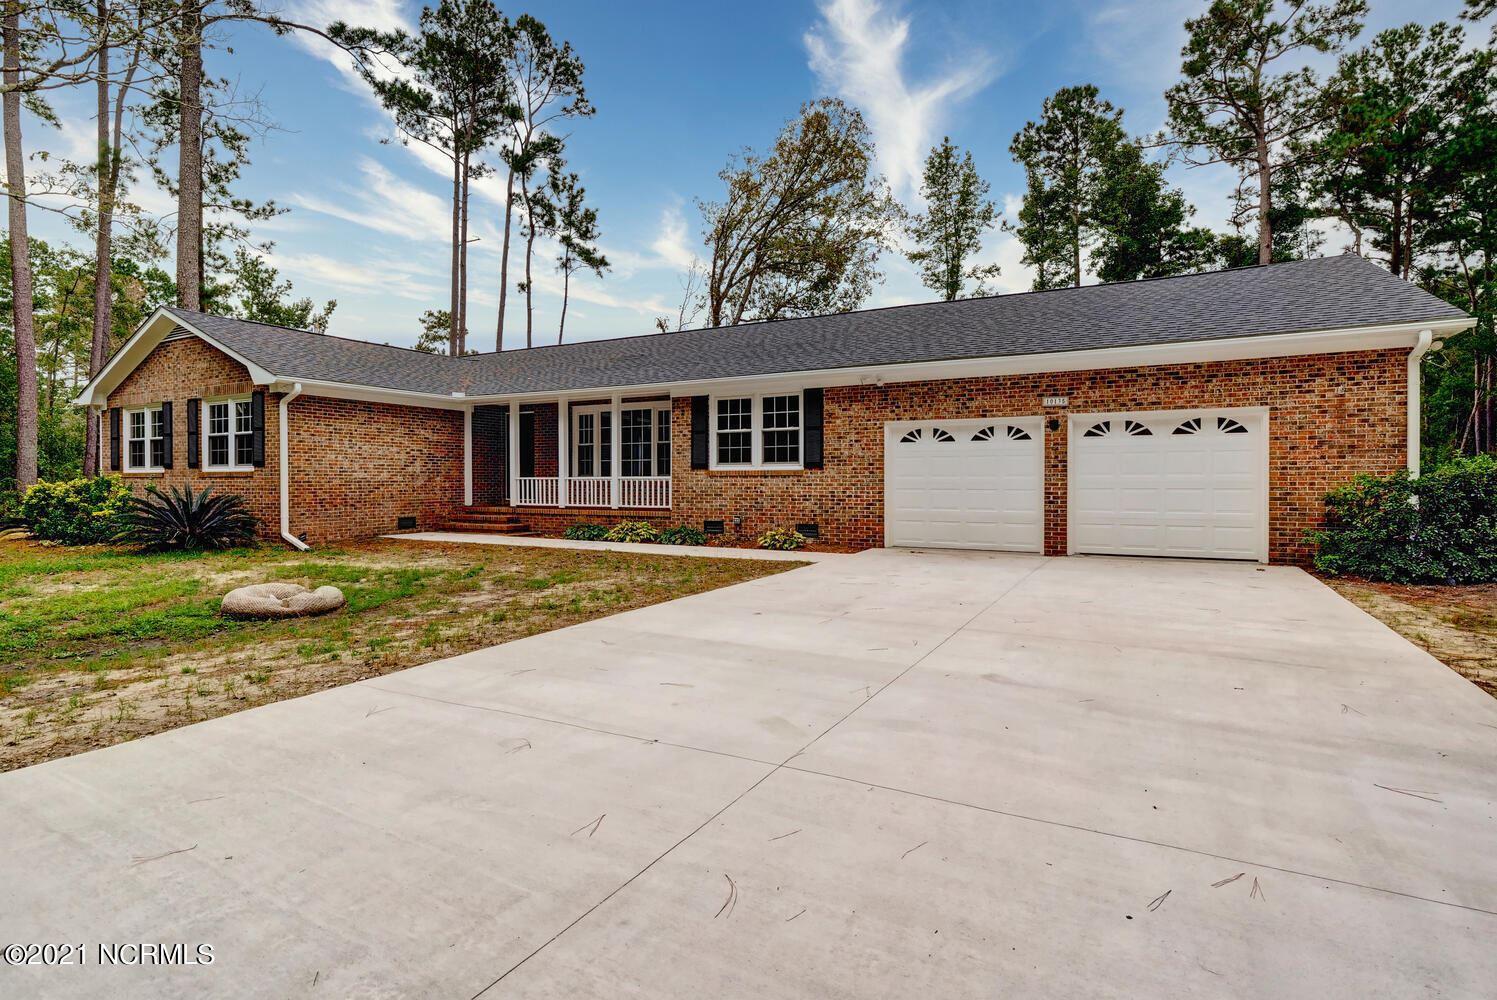 Photo of 10135 S Olde Towne Wynd SE, Leland, NC 28451 (MLS # 100295052)